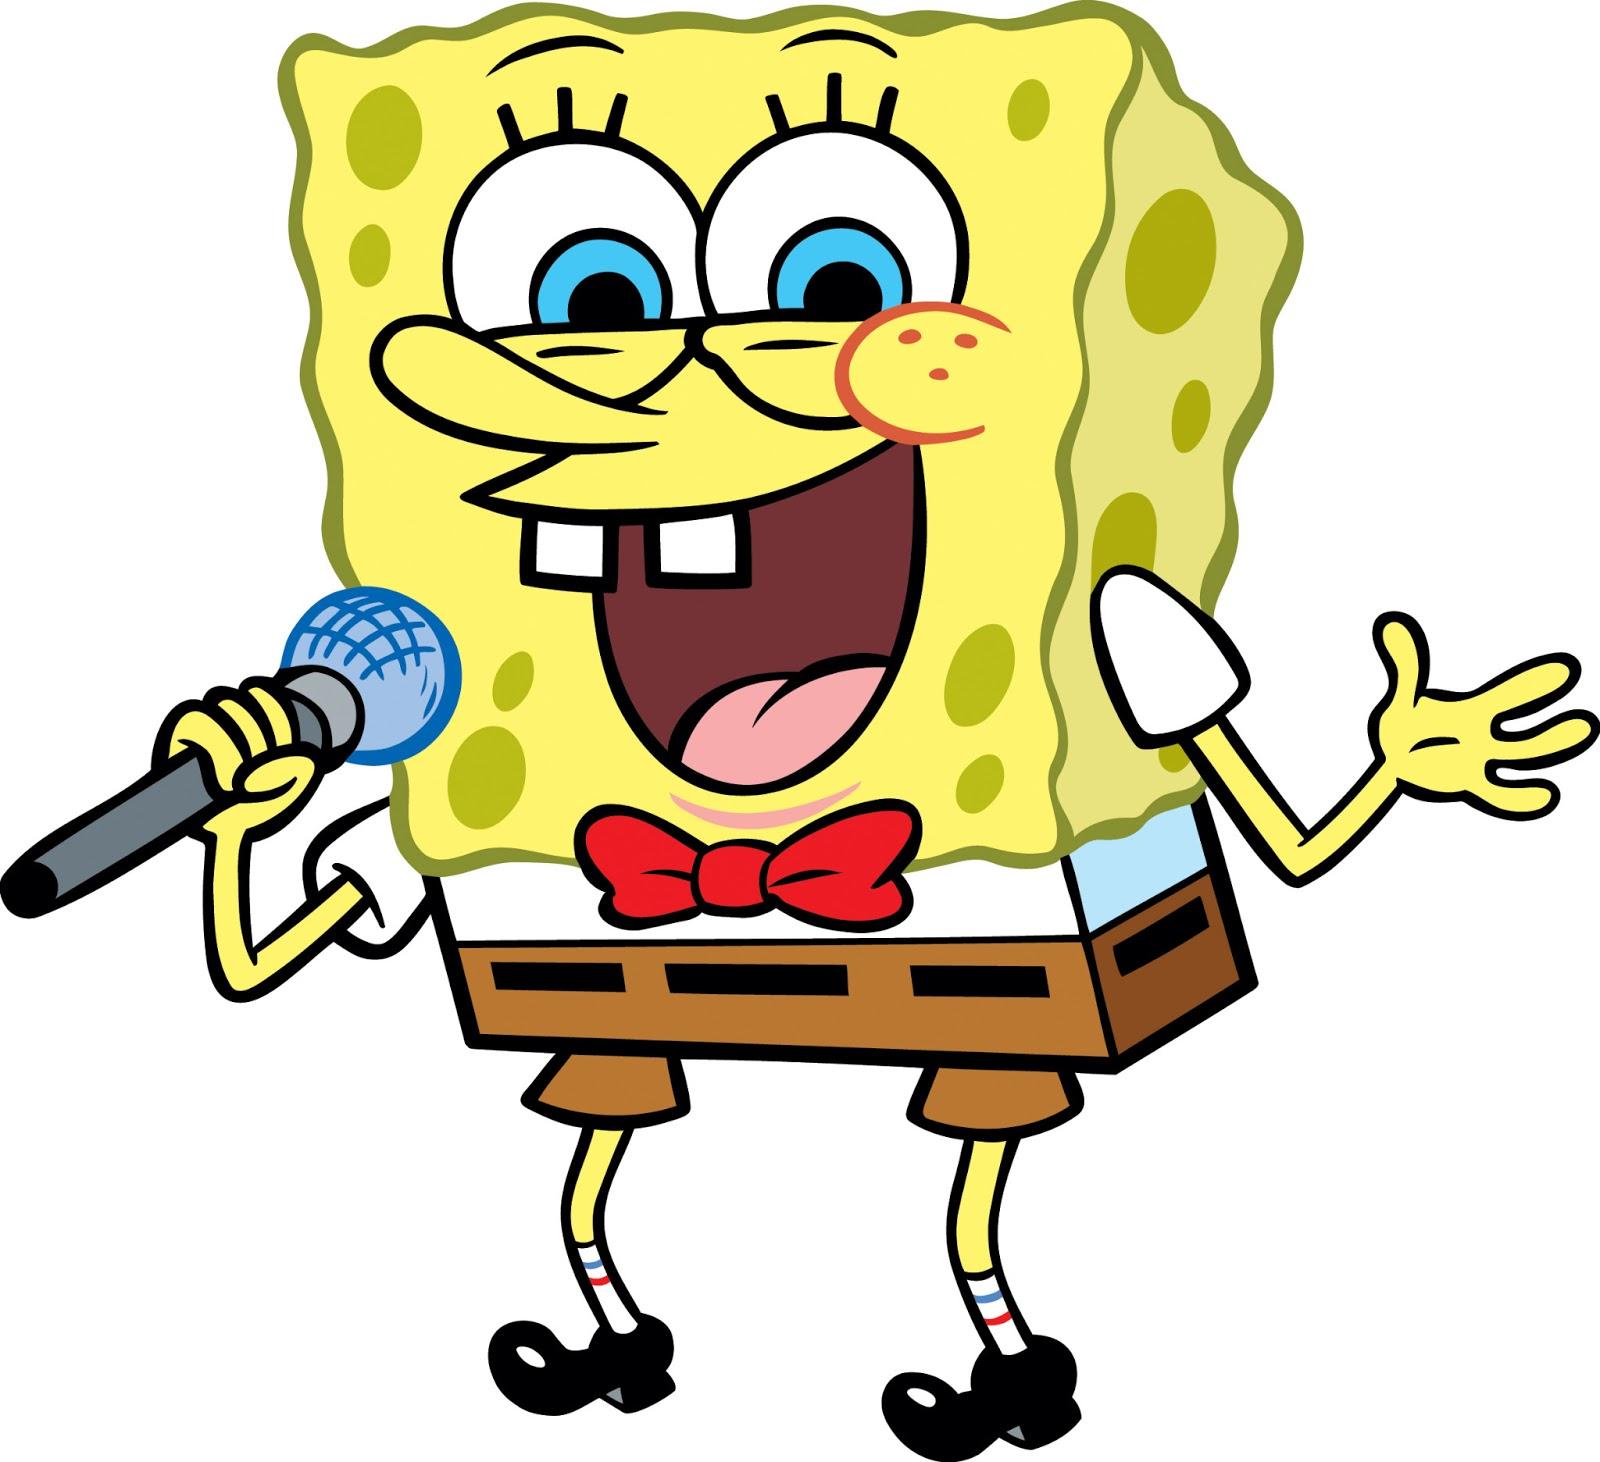 1600x1462 American Top Cartoons Spongebob Squarepants Cartoon Network